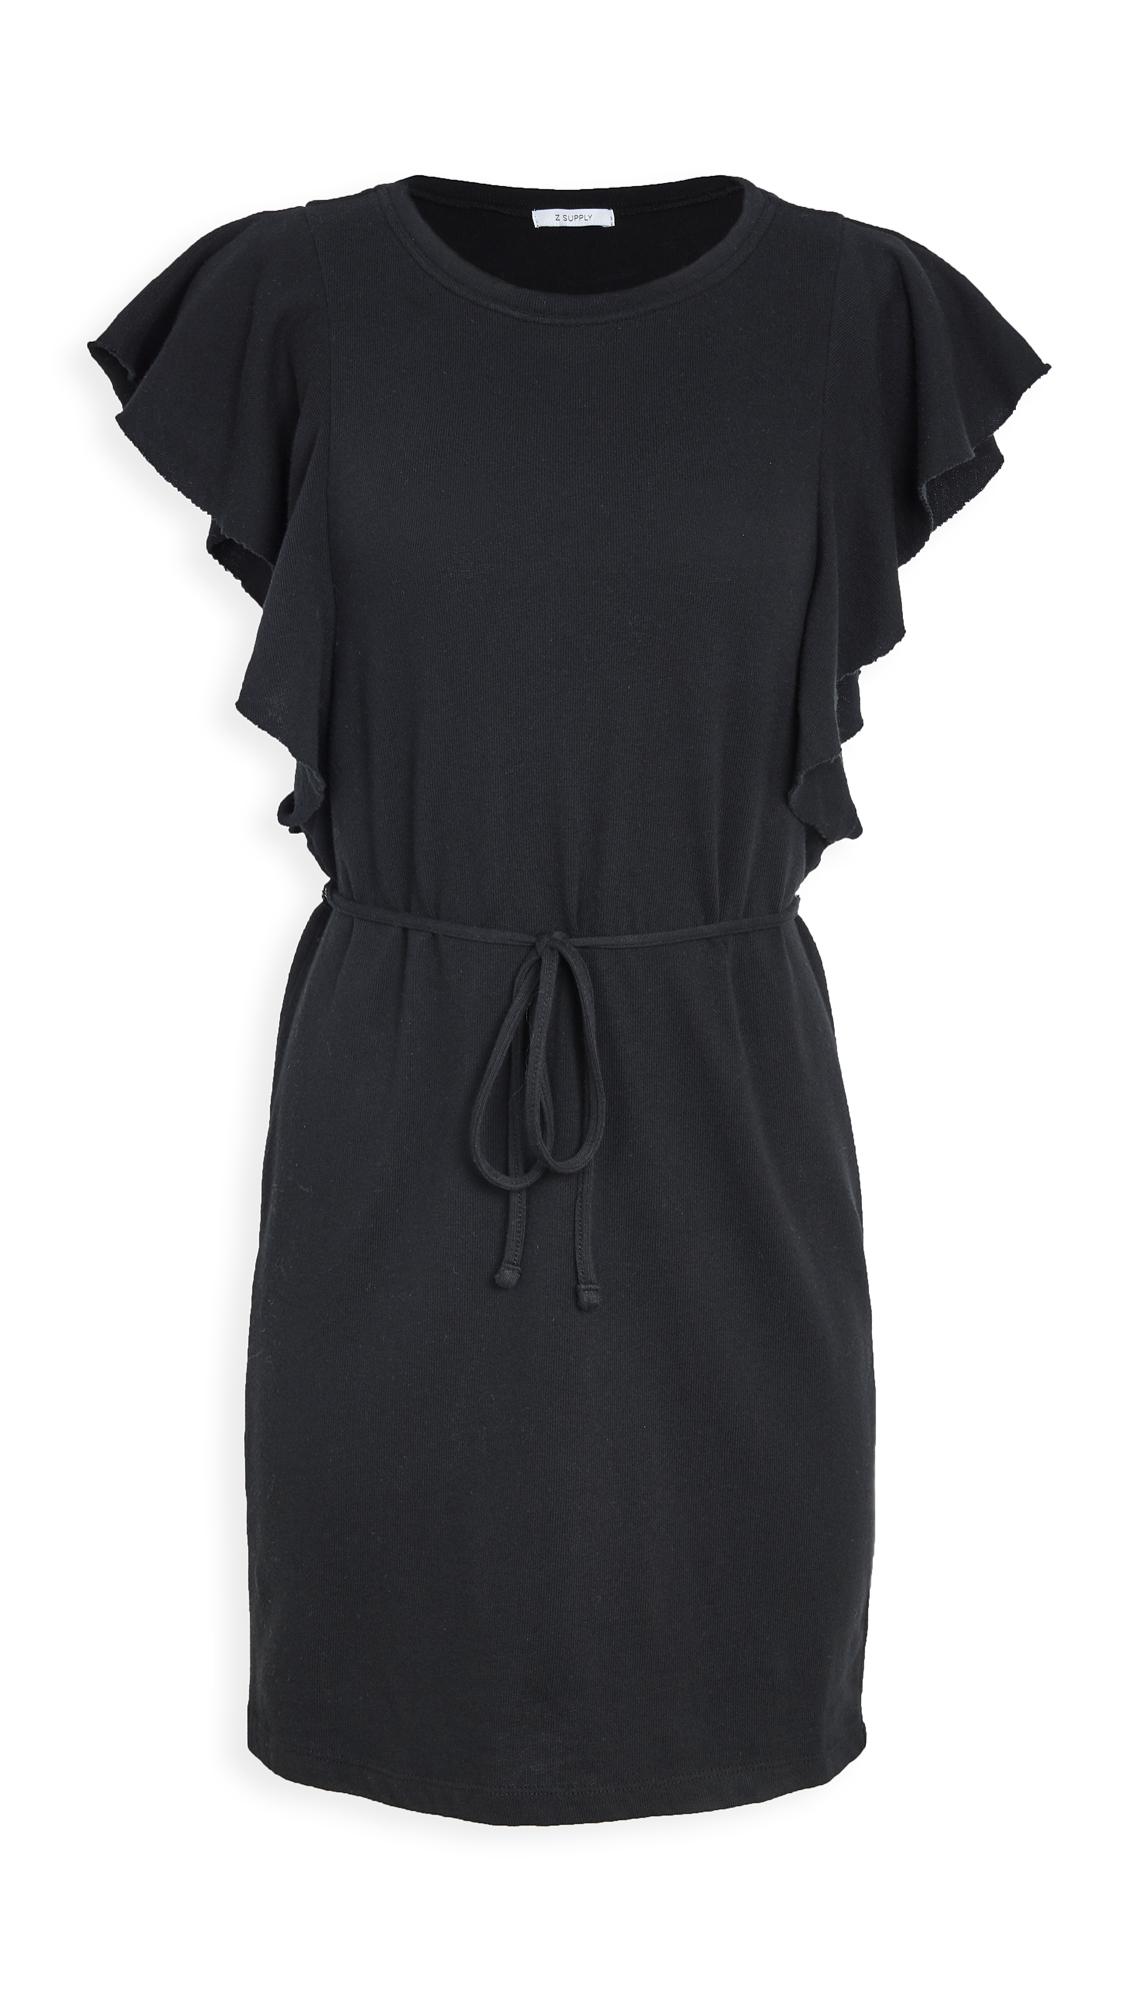 Z Supply Capri Ruffle Dress